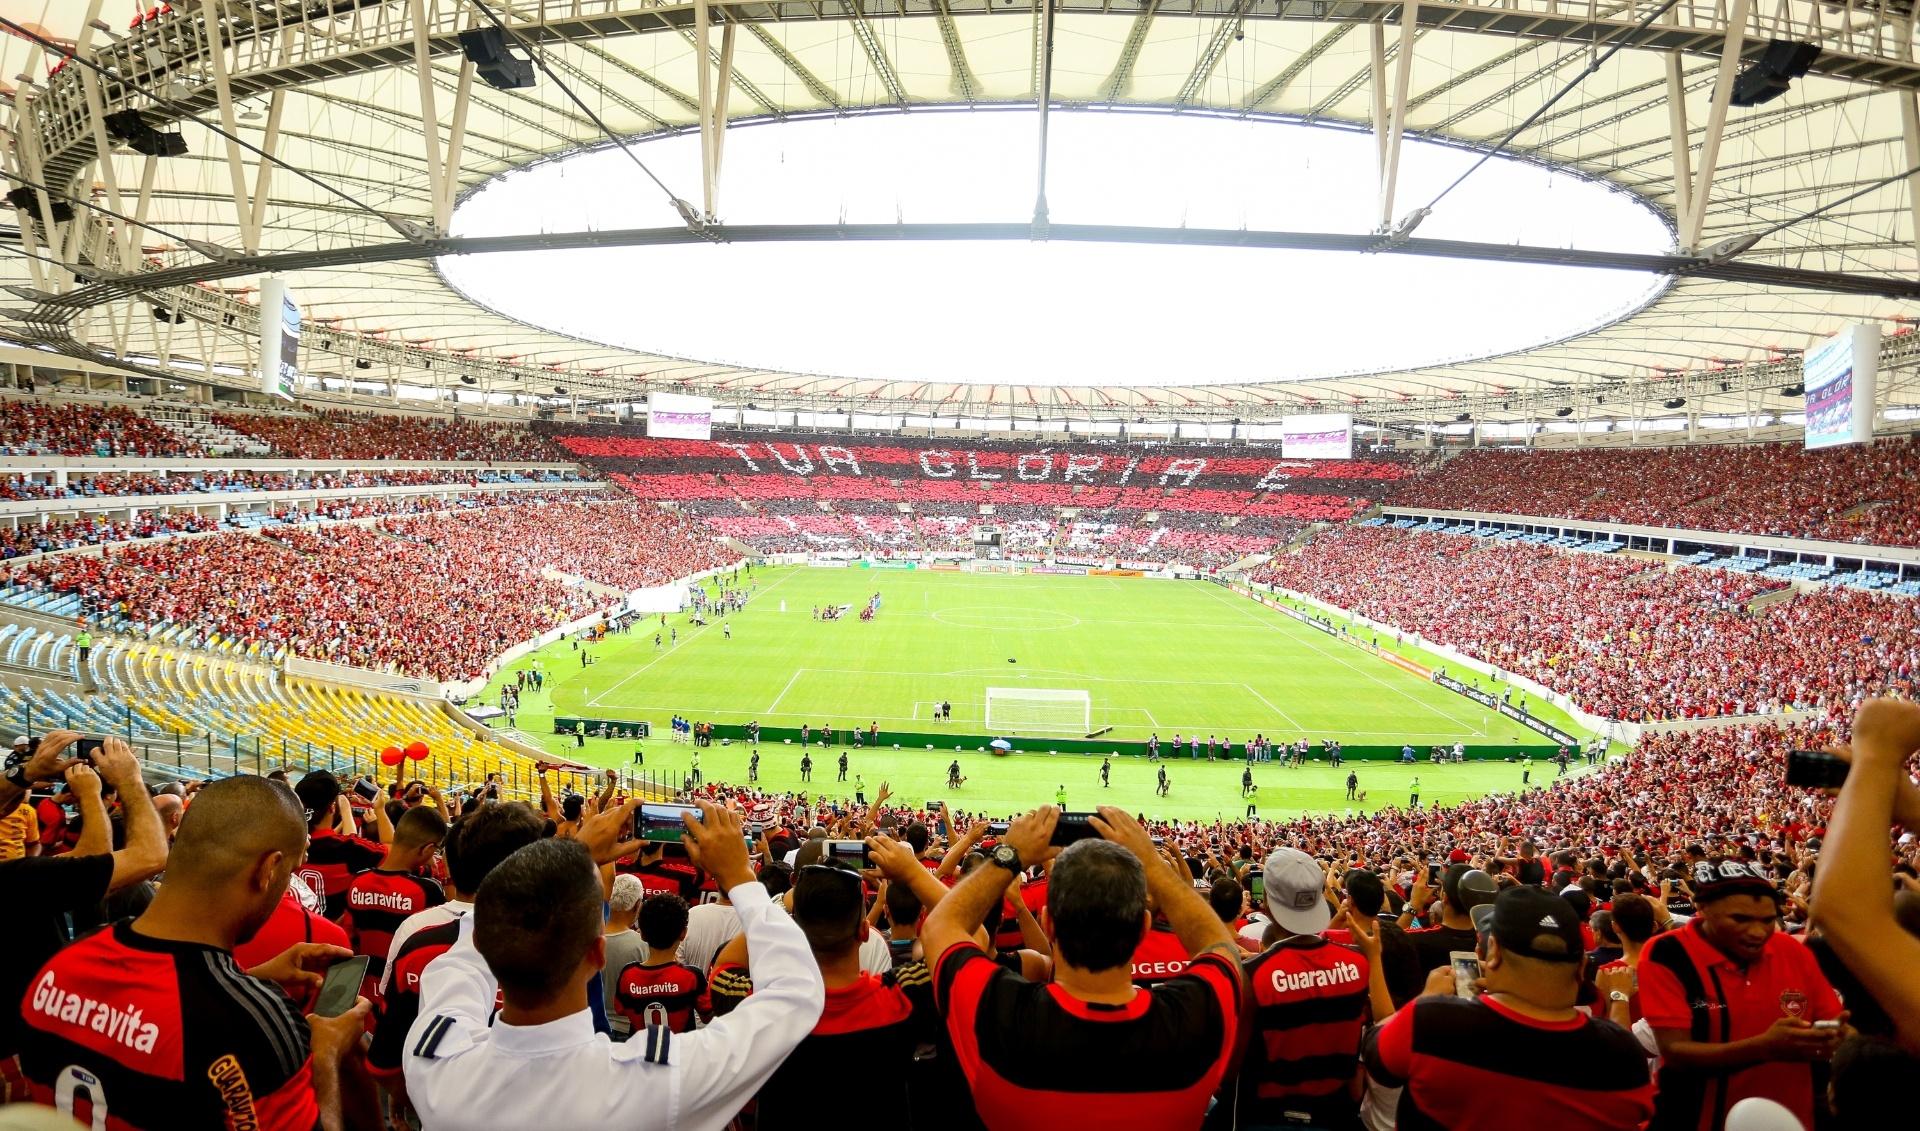 Flamengo x San Lorenzo já tem 50 mil ingressos vendidos - 07 03 2017 - UOL  Esporte 7a5db2275f5c1